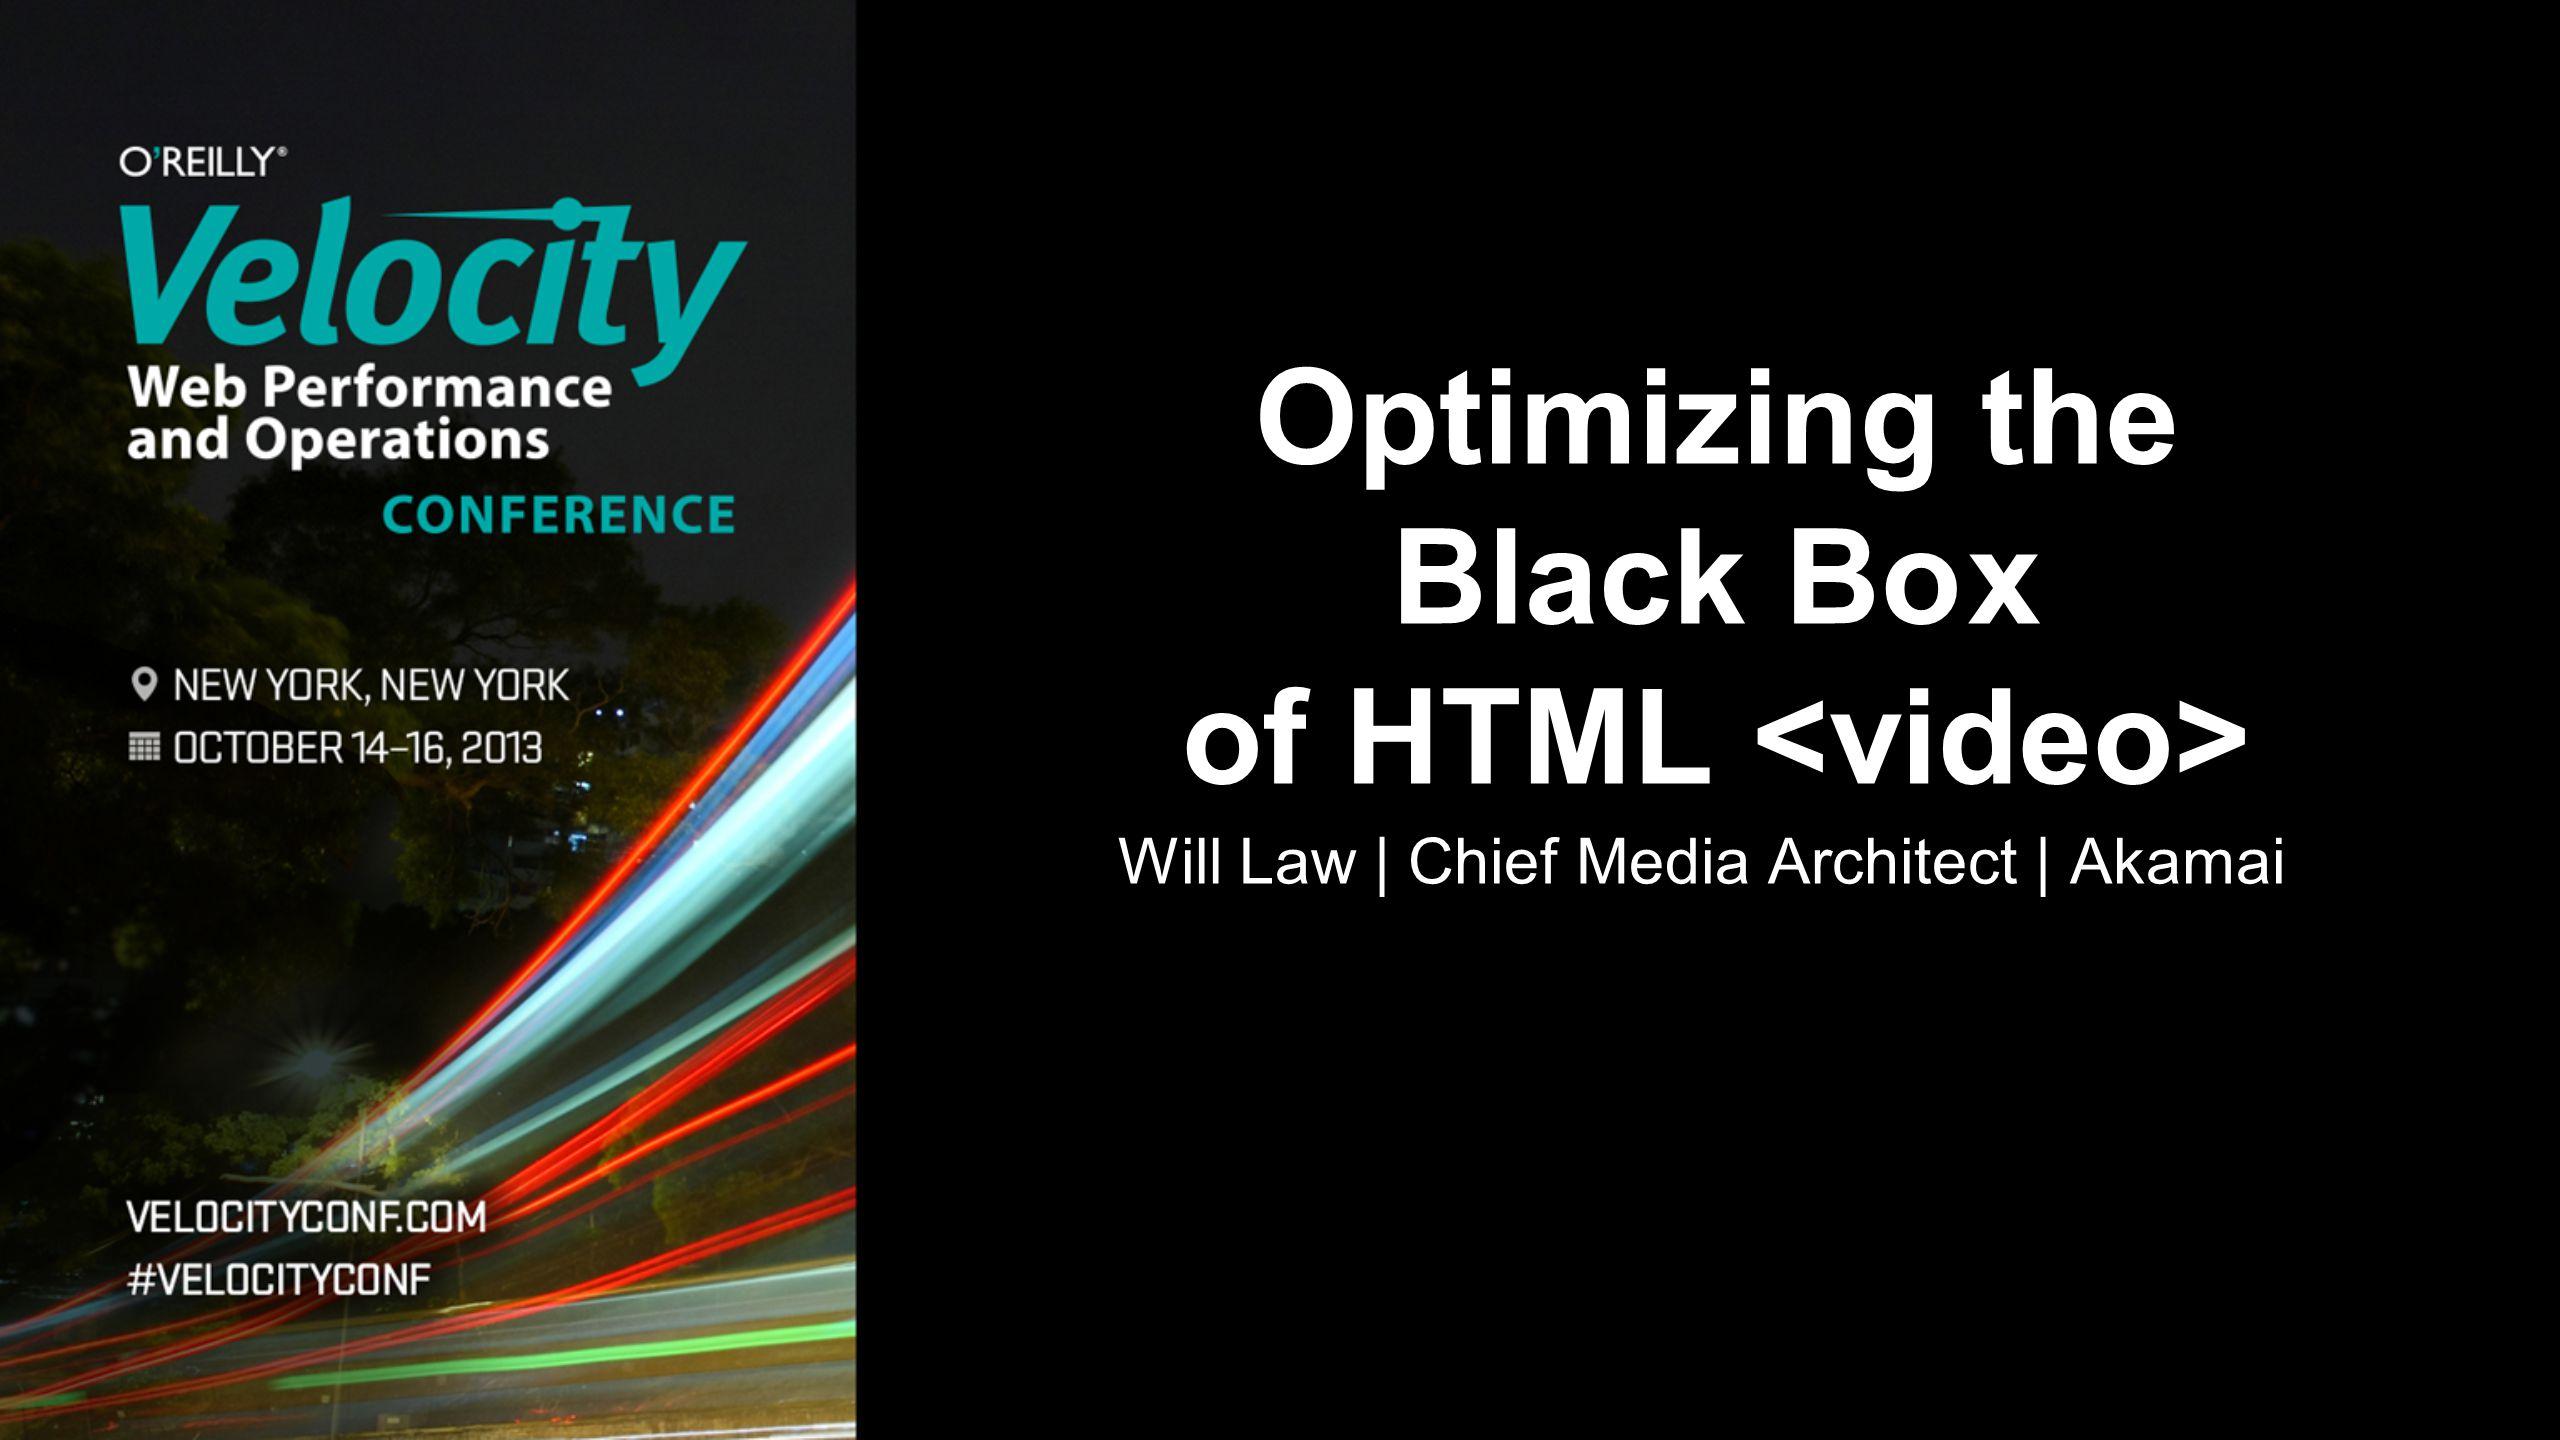 Will Law | Chief Media Architect | Akamai Optimizing the Black Box of HTML